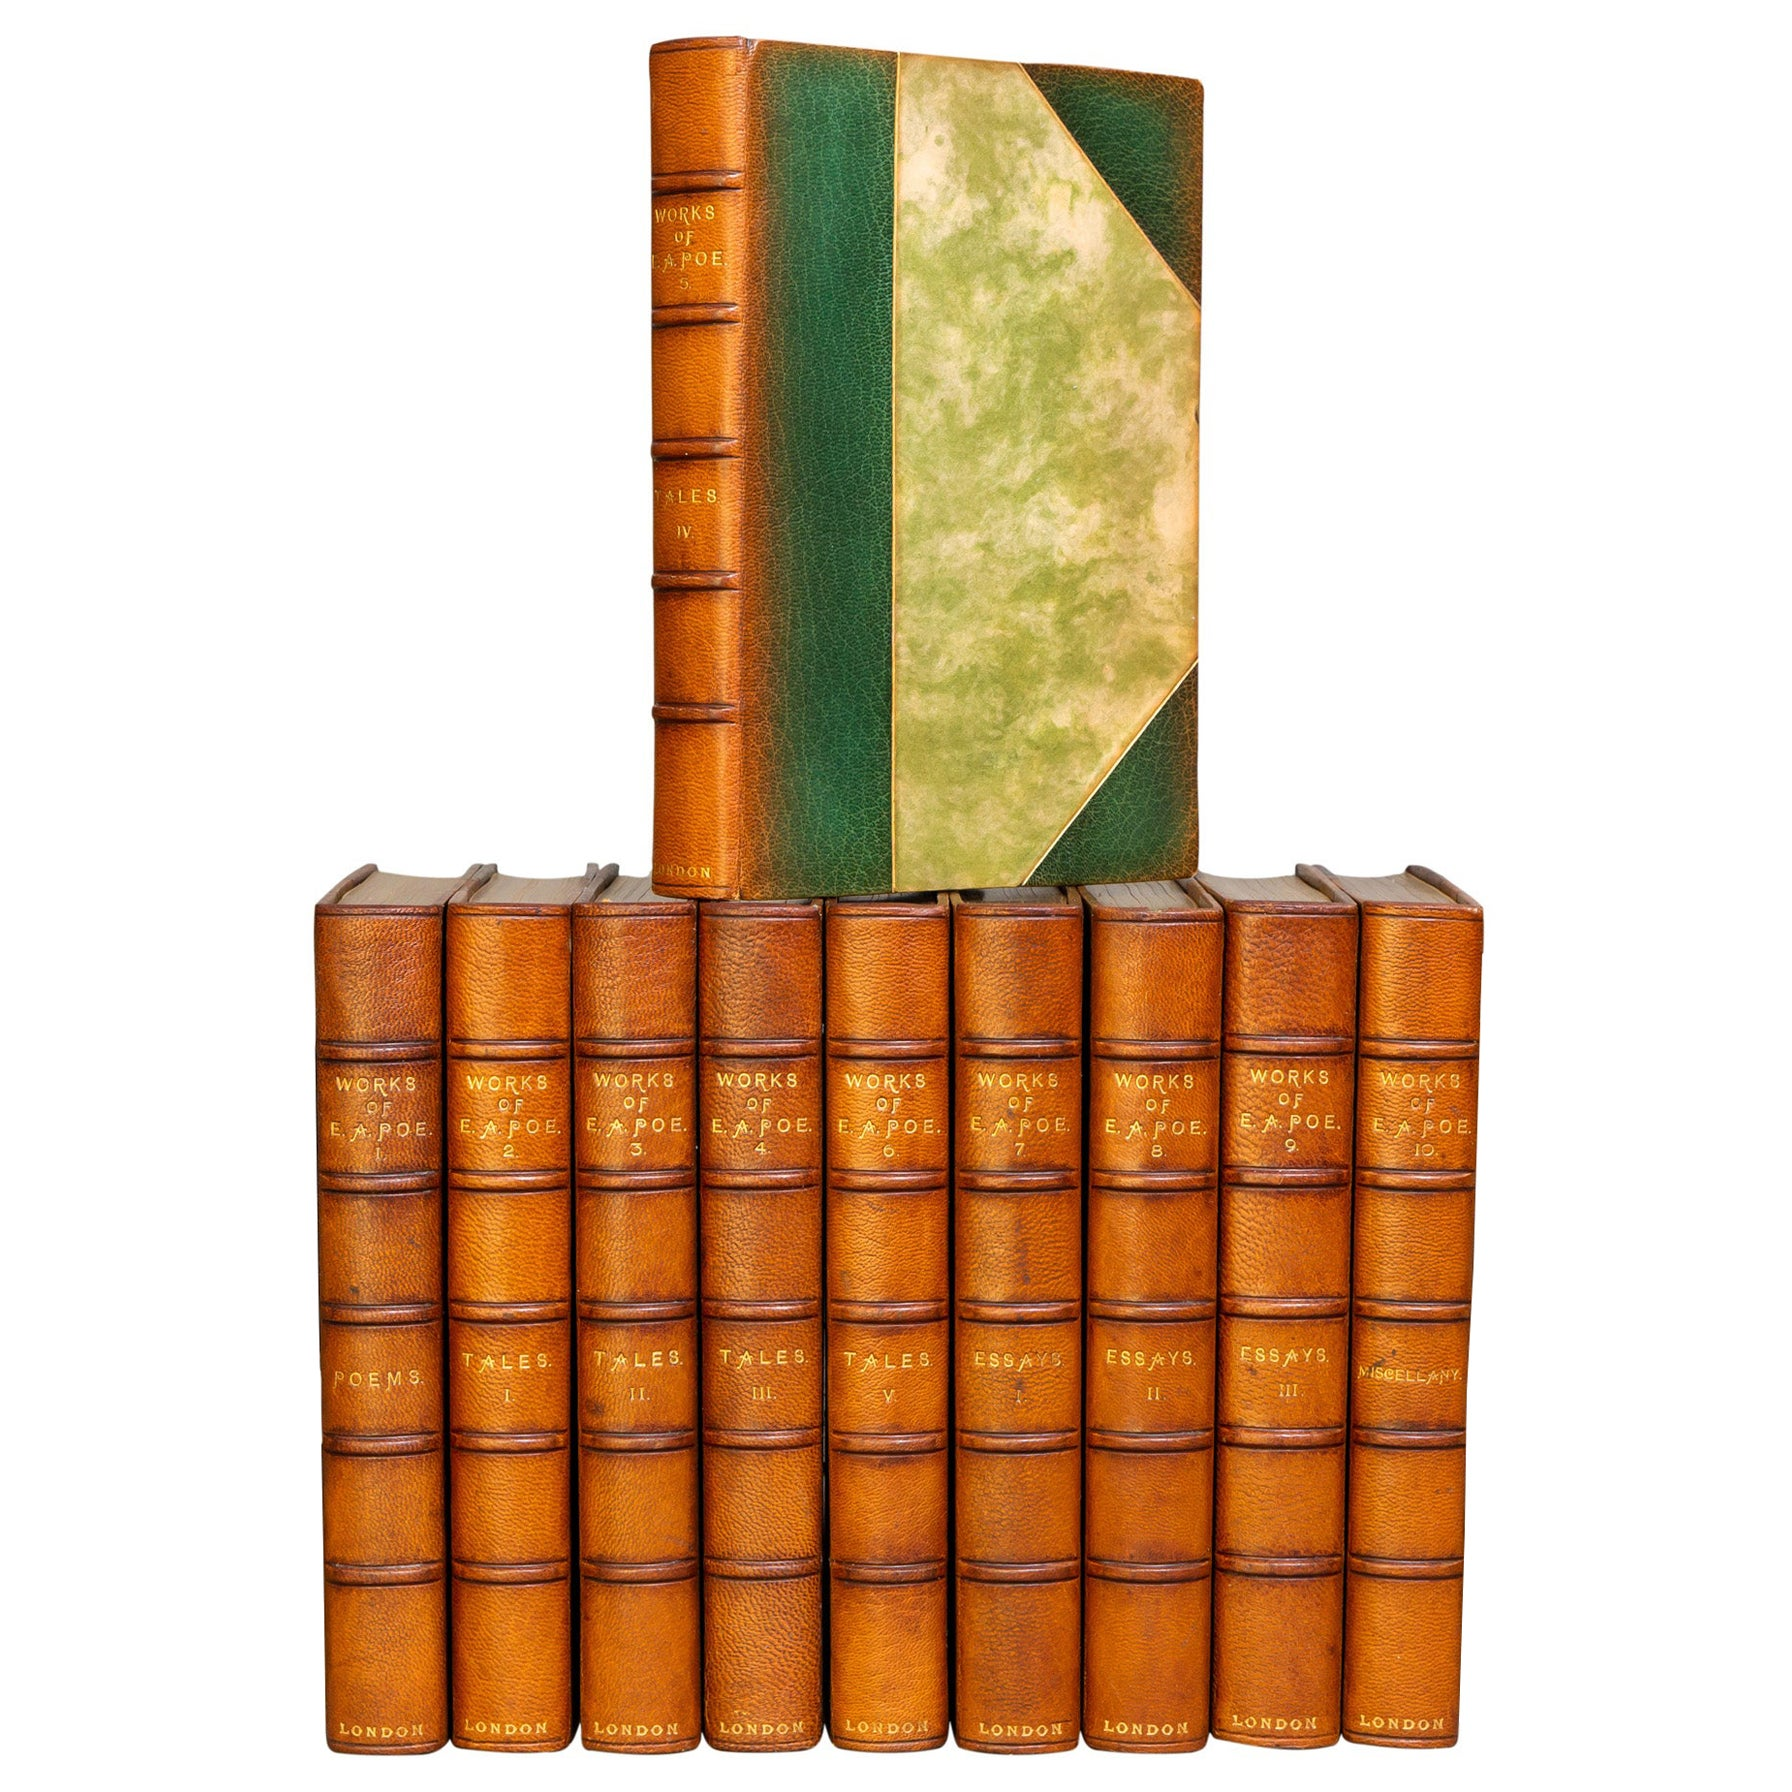 Edgar Allan Poe, The Complete Works